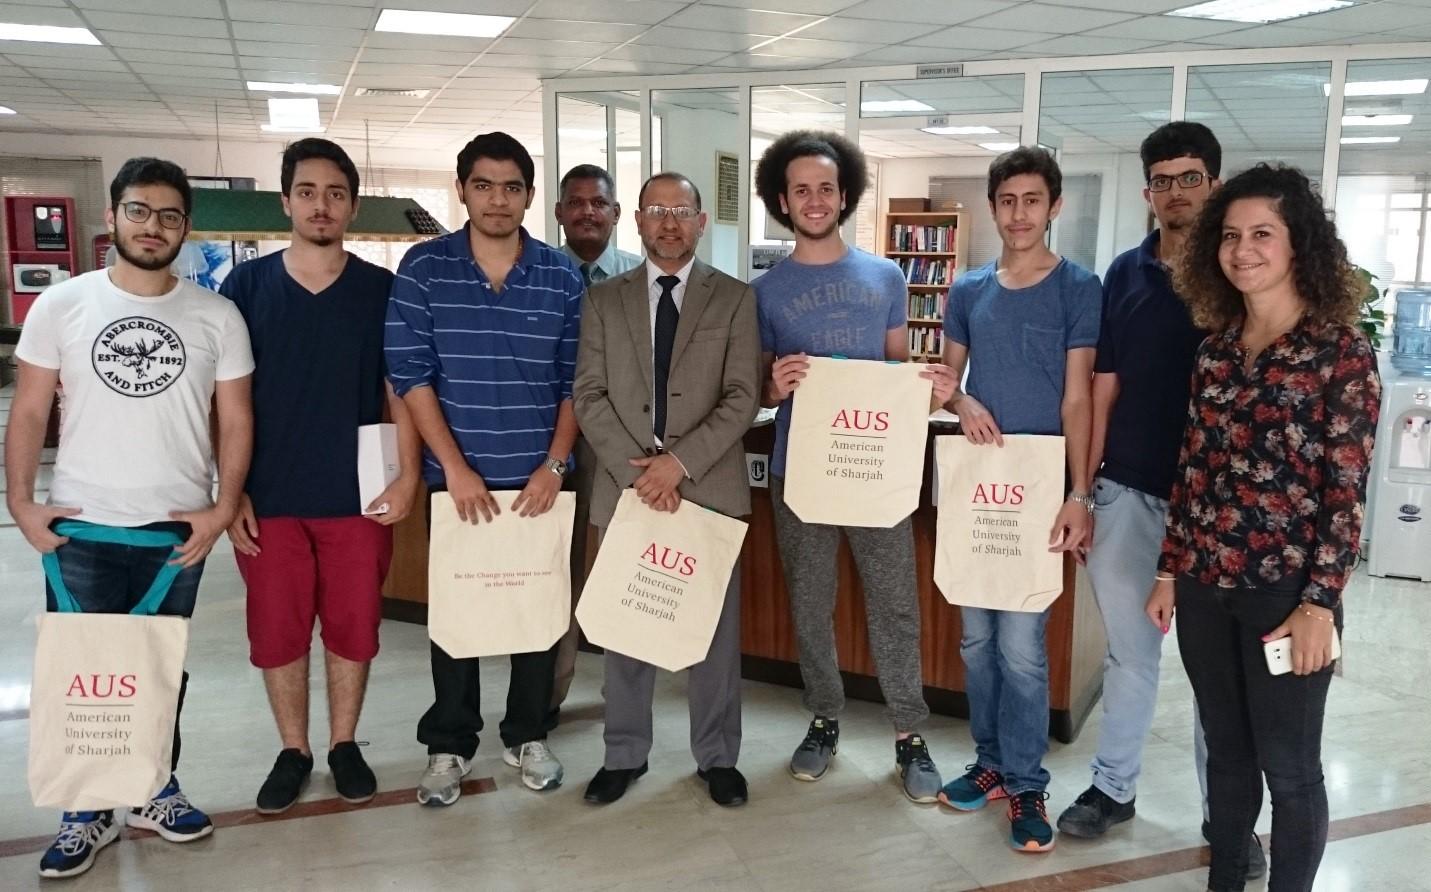 American_University_of_Sharjah_Evergy_Saving_Competition_10.jpg